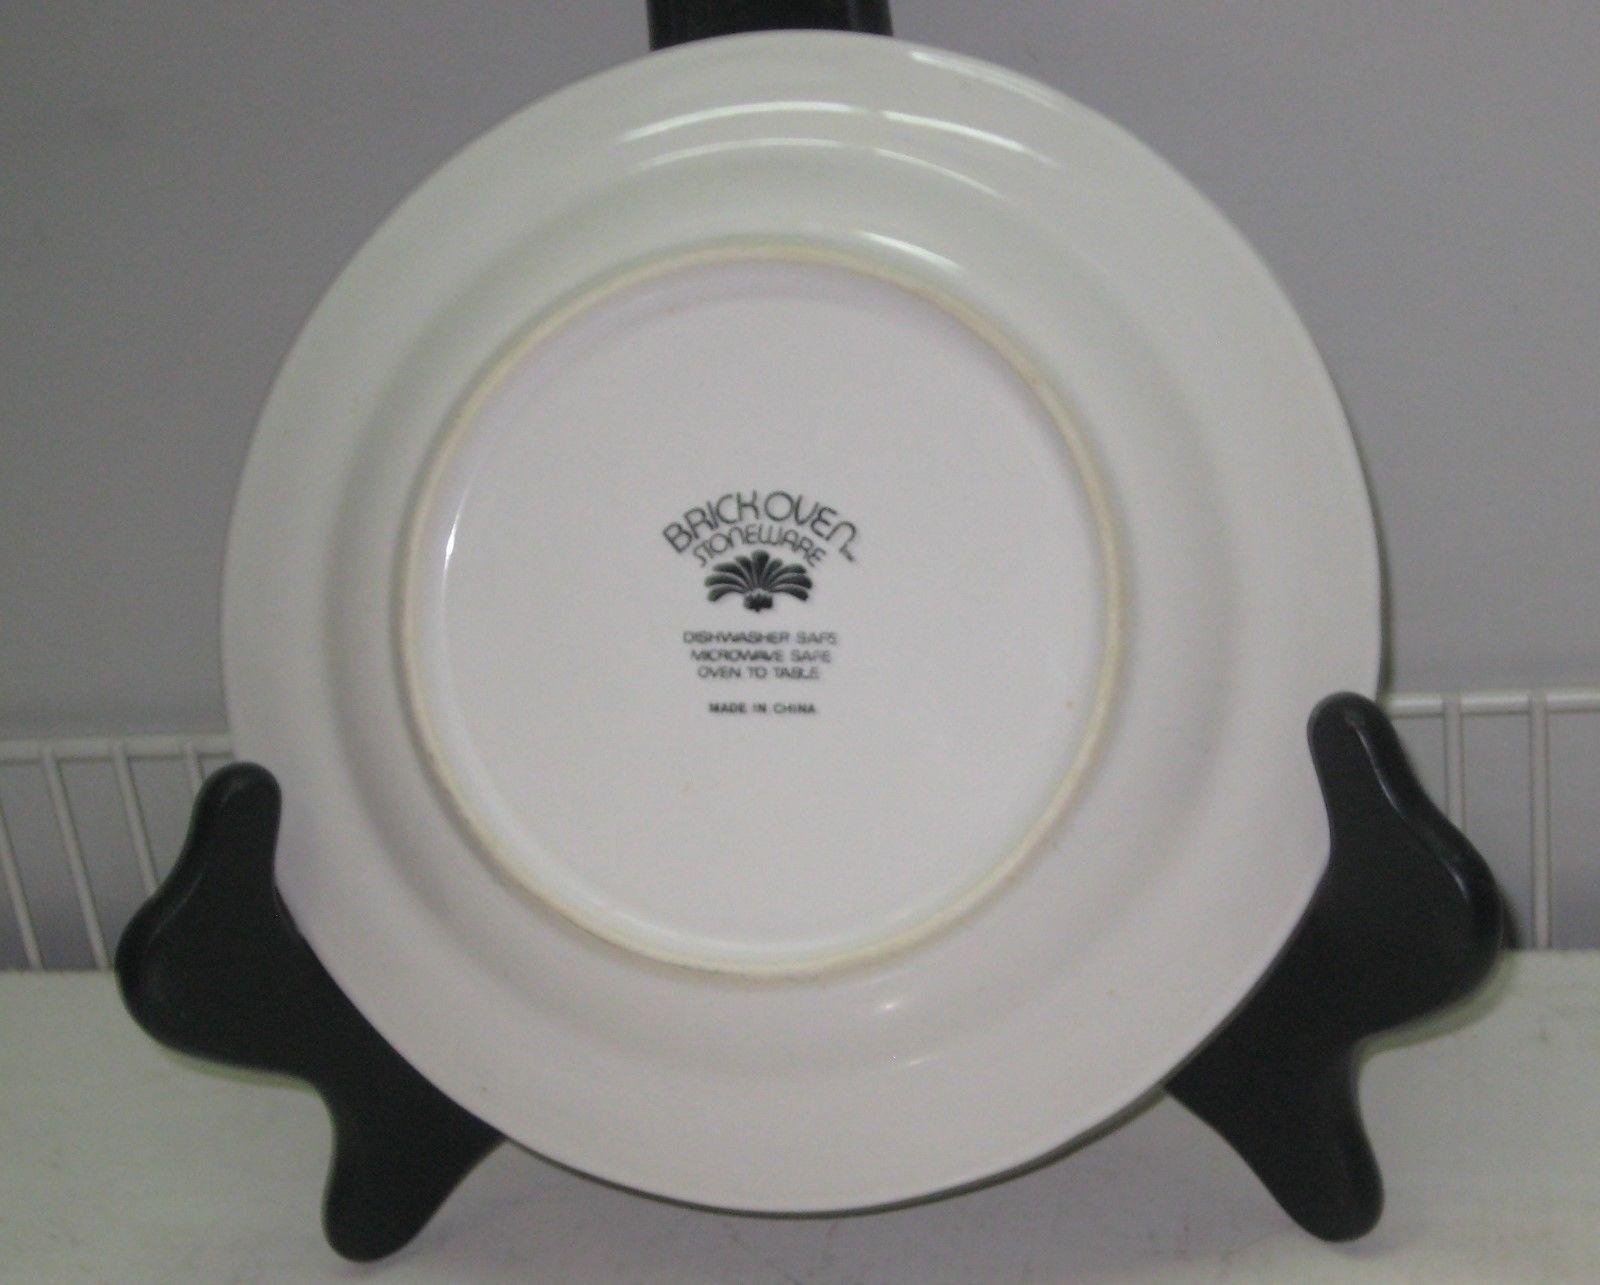 jardin bleu brick oven brickoven stoneware salad plate 7 3